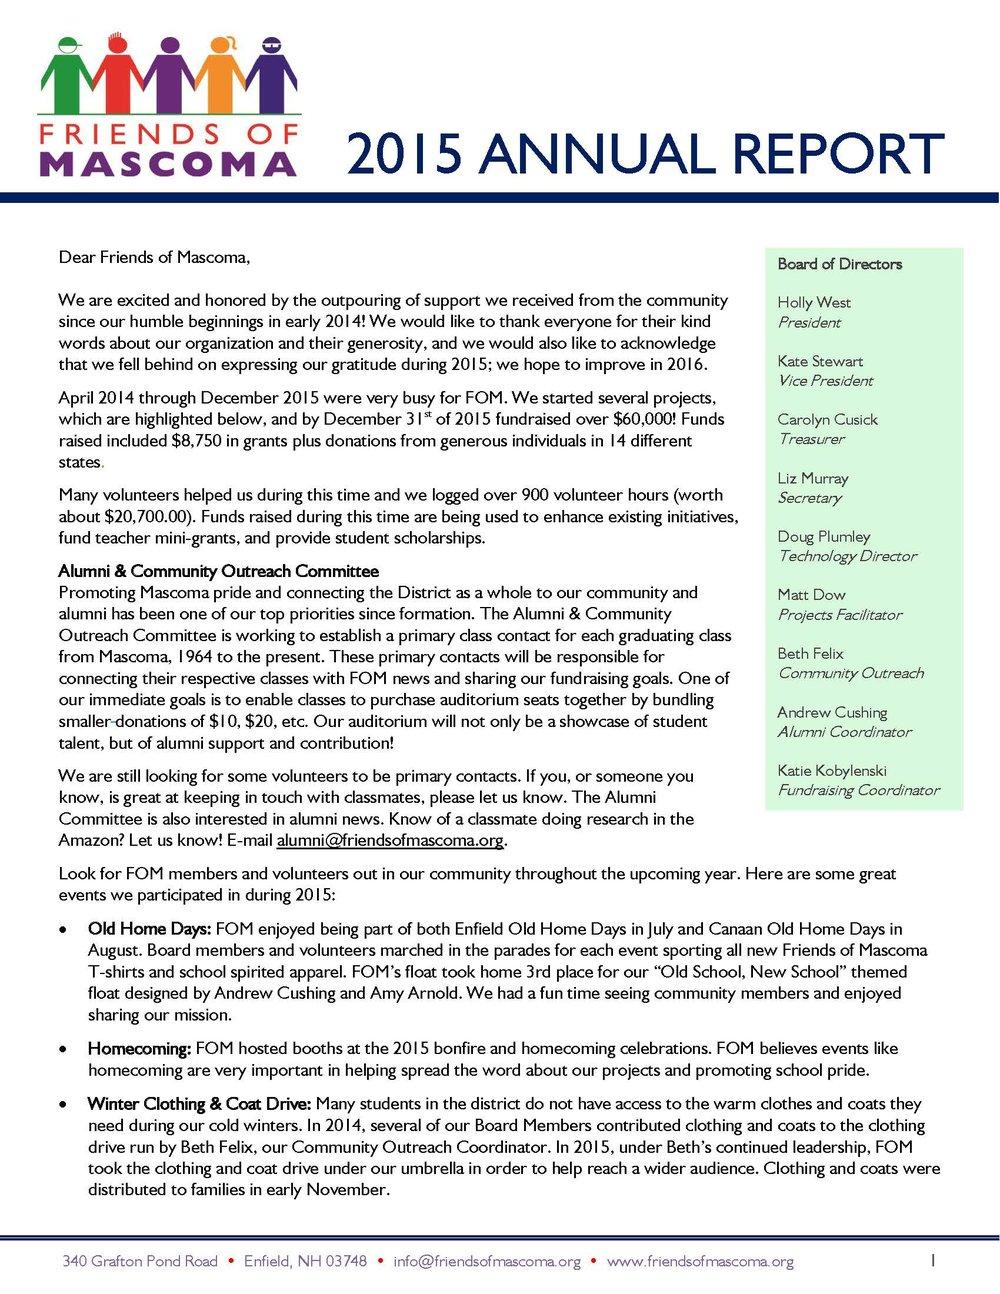 FOM_2015 Newsletter Final 2-27-16_Page_1.jpg